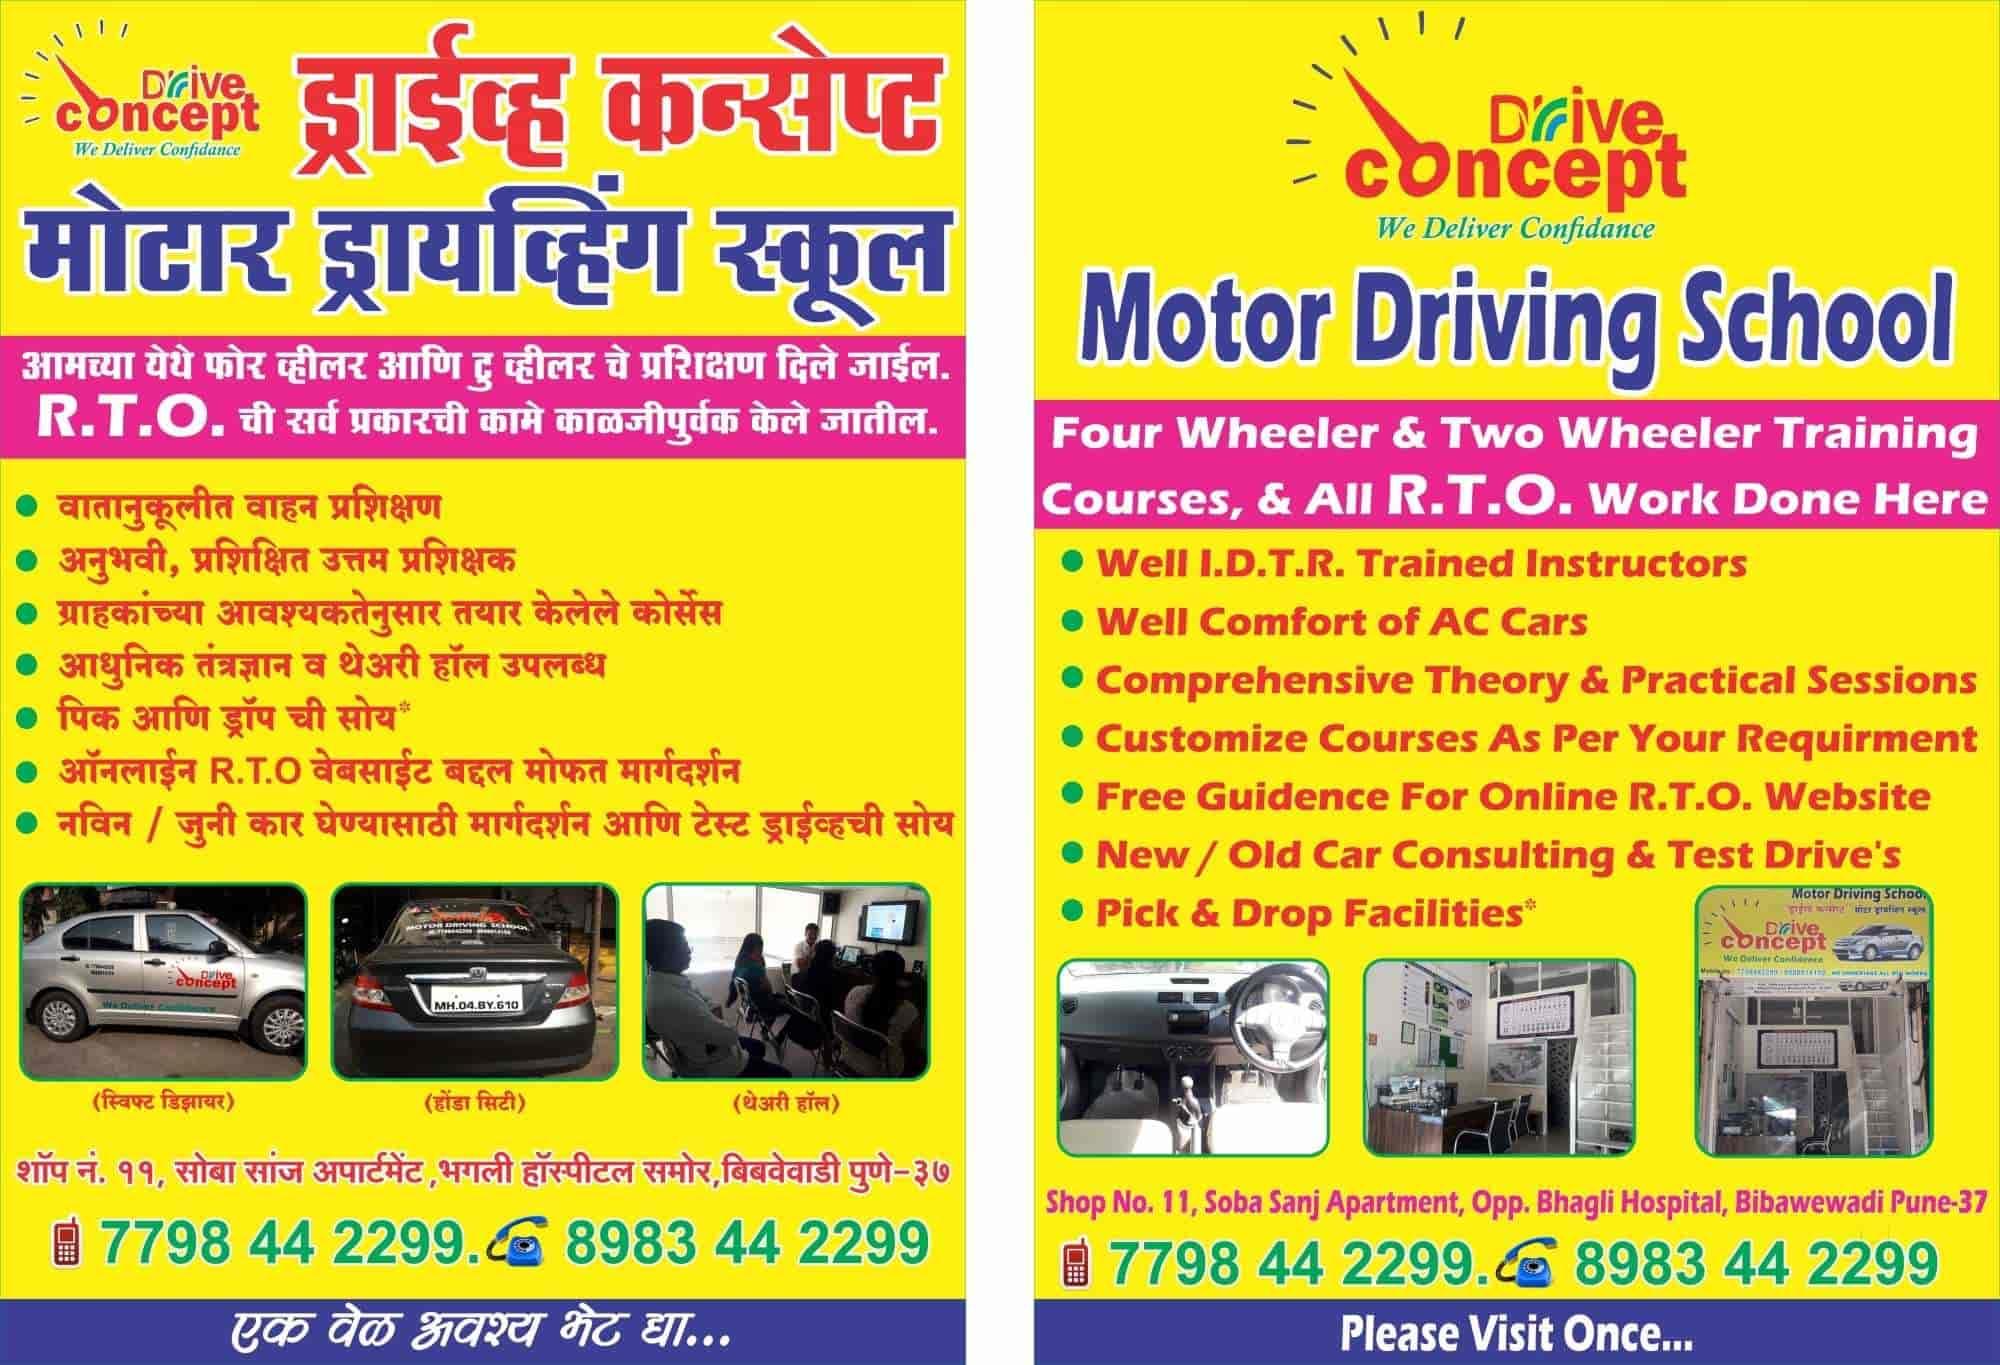 Drive Concept Motor Driving School Photos, Bibvewadi, Pune